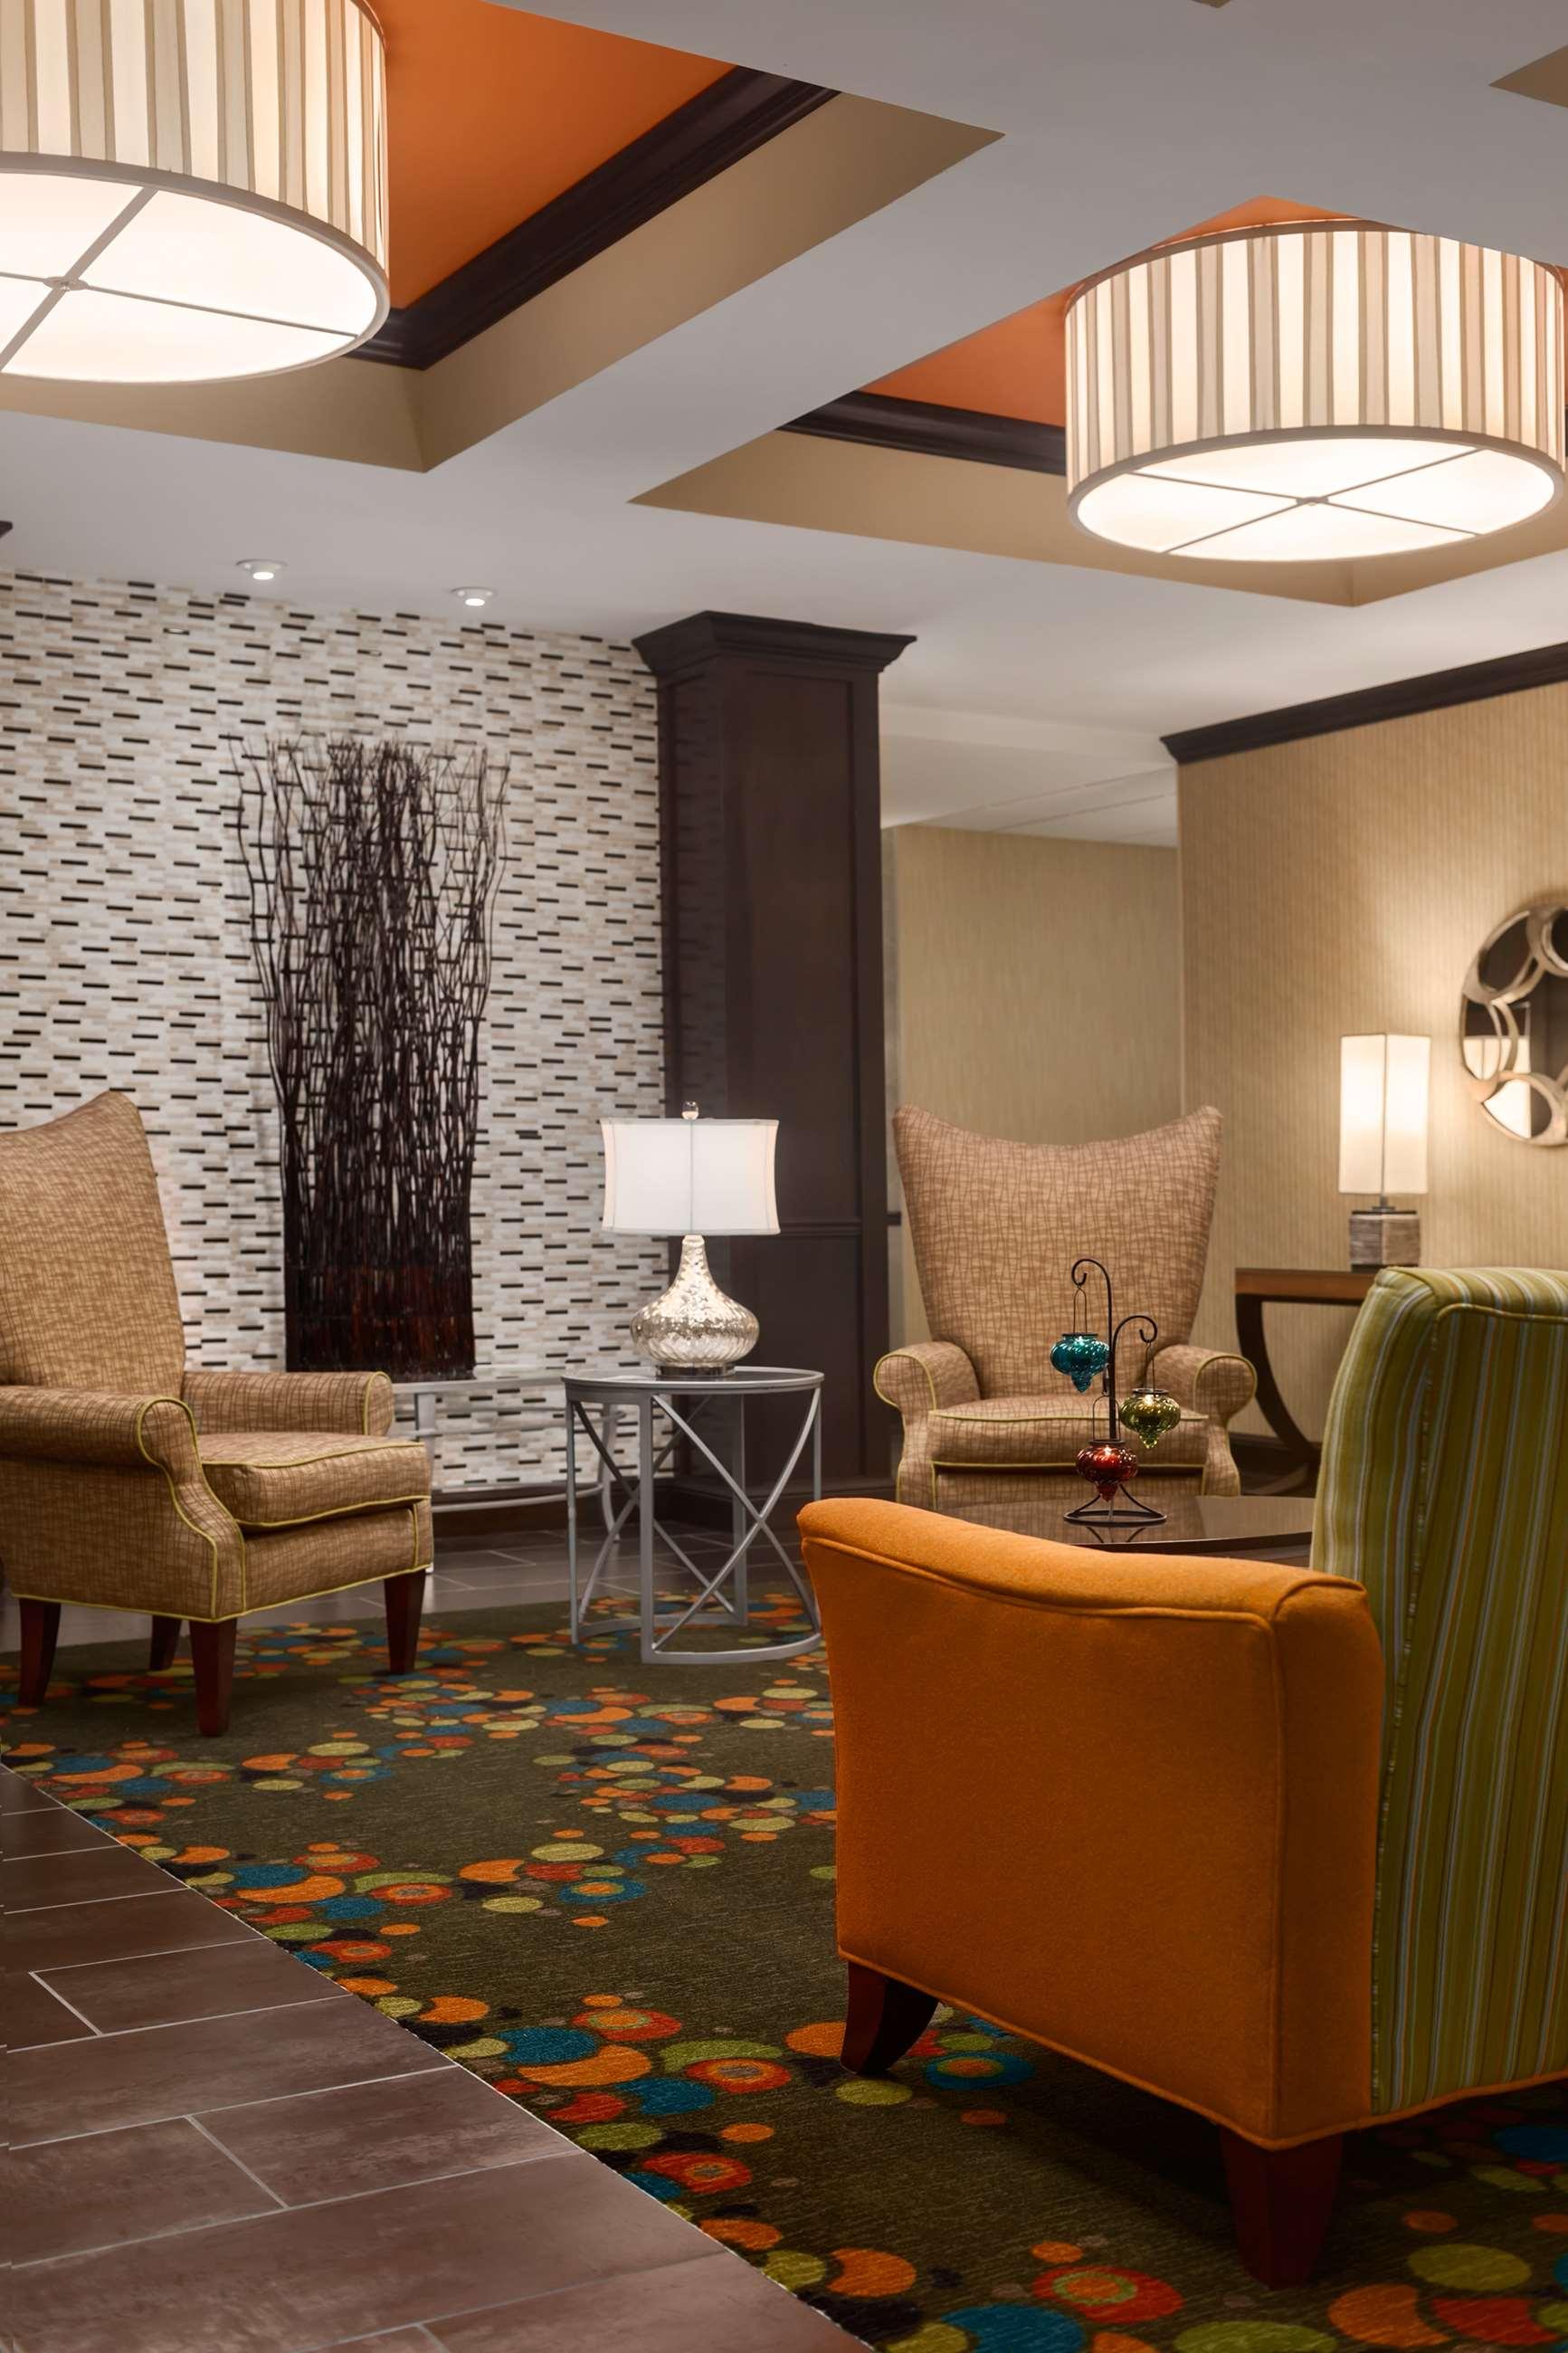 Homewood Suites by Hilton Joplin, MO image 2